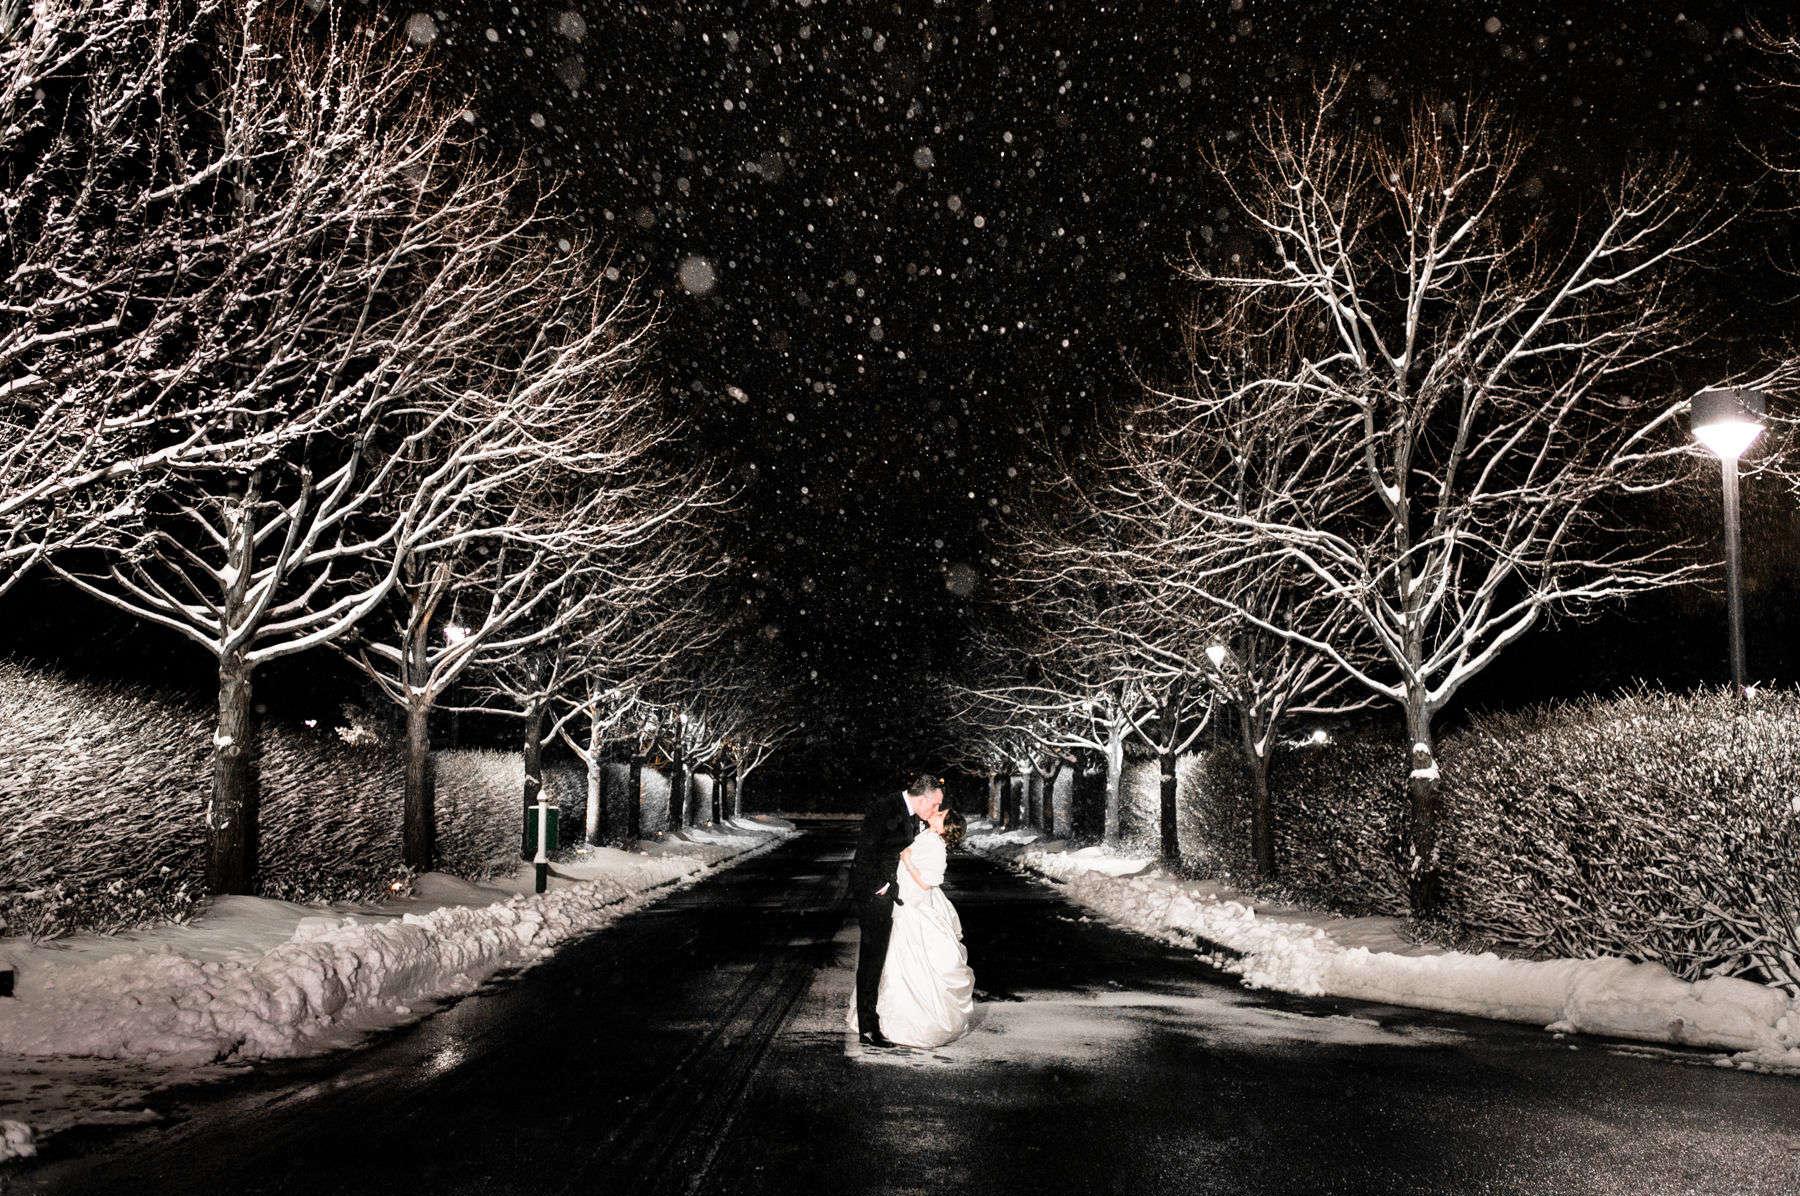 525-David Starke photography wedding photographer